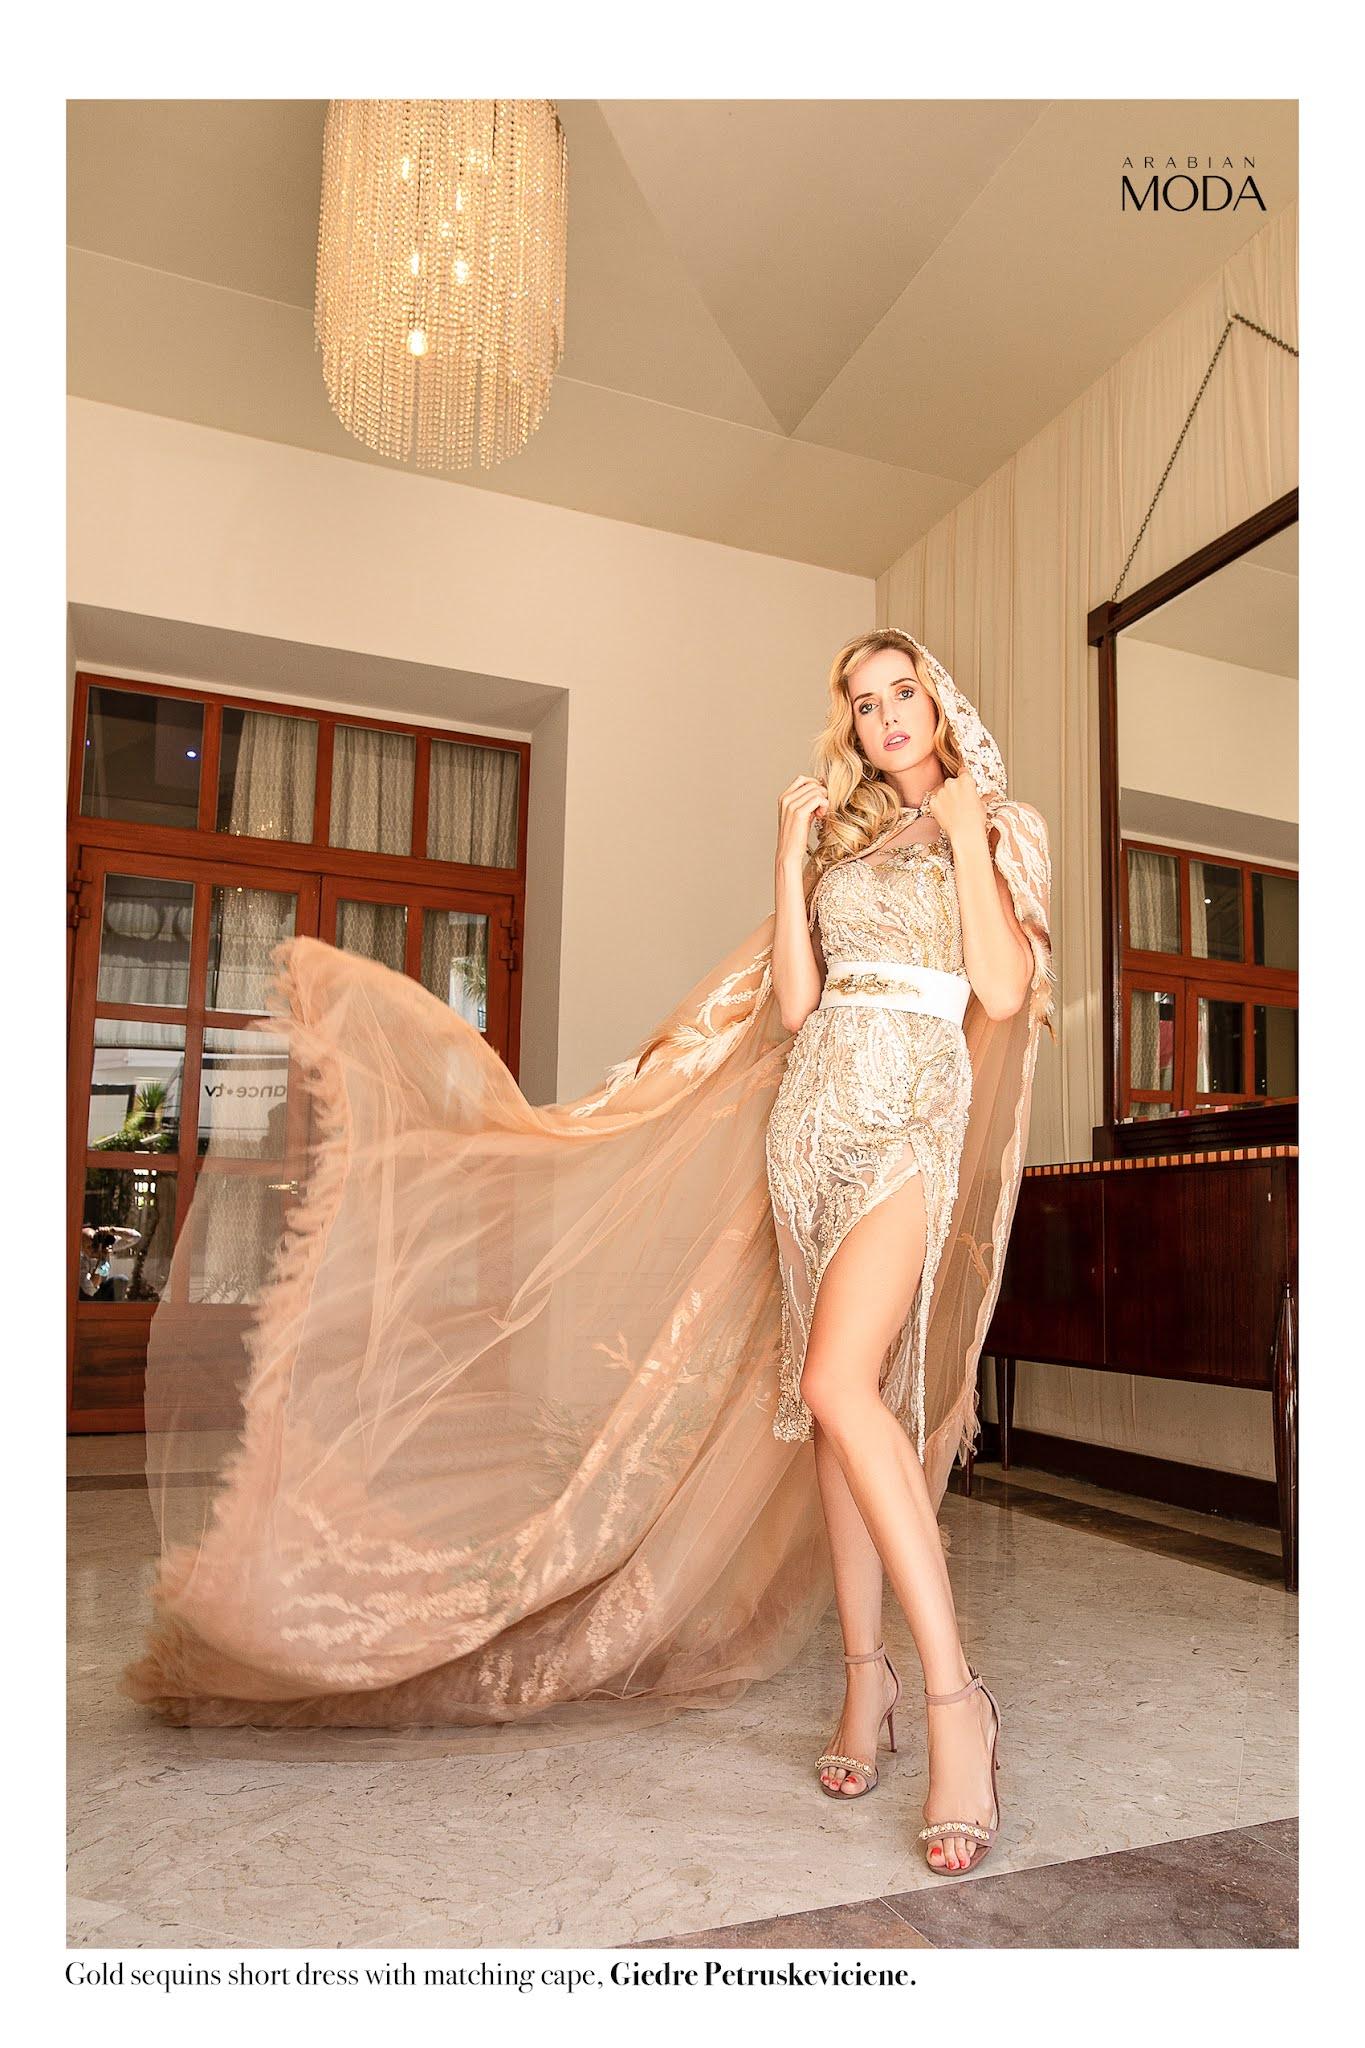 Arabian Moda x Wilma Elles